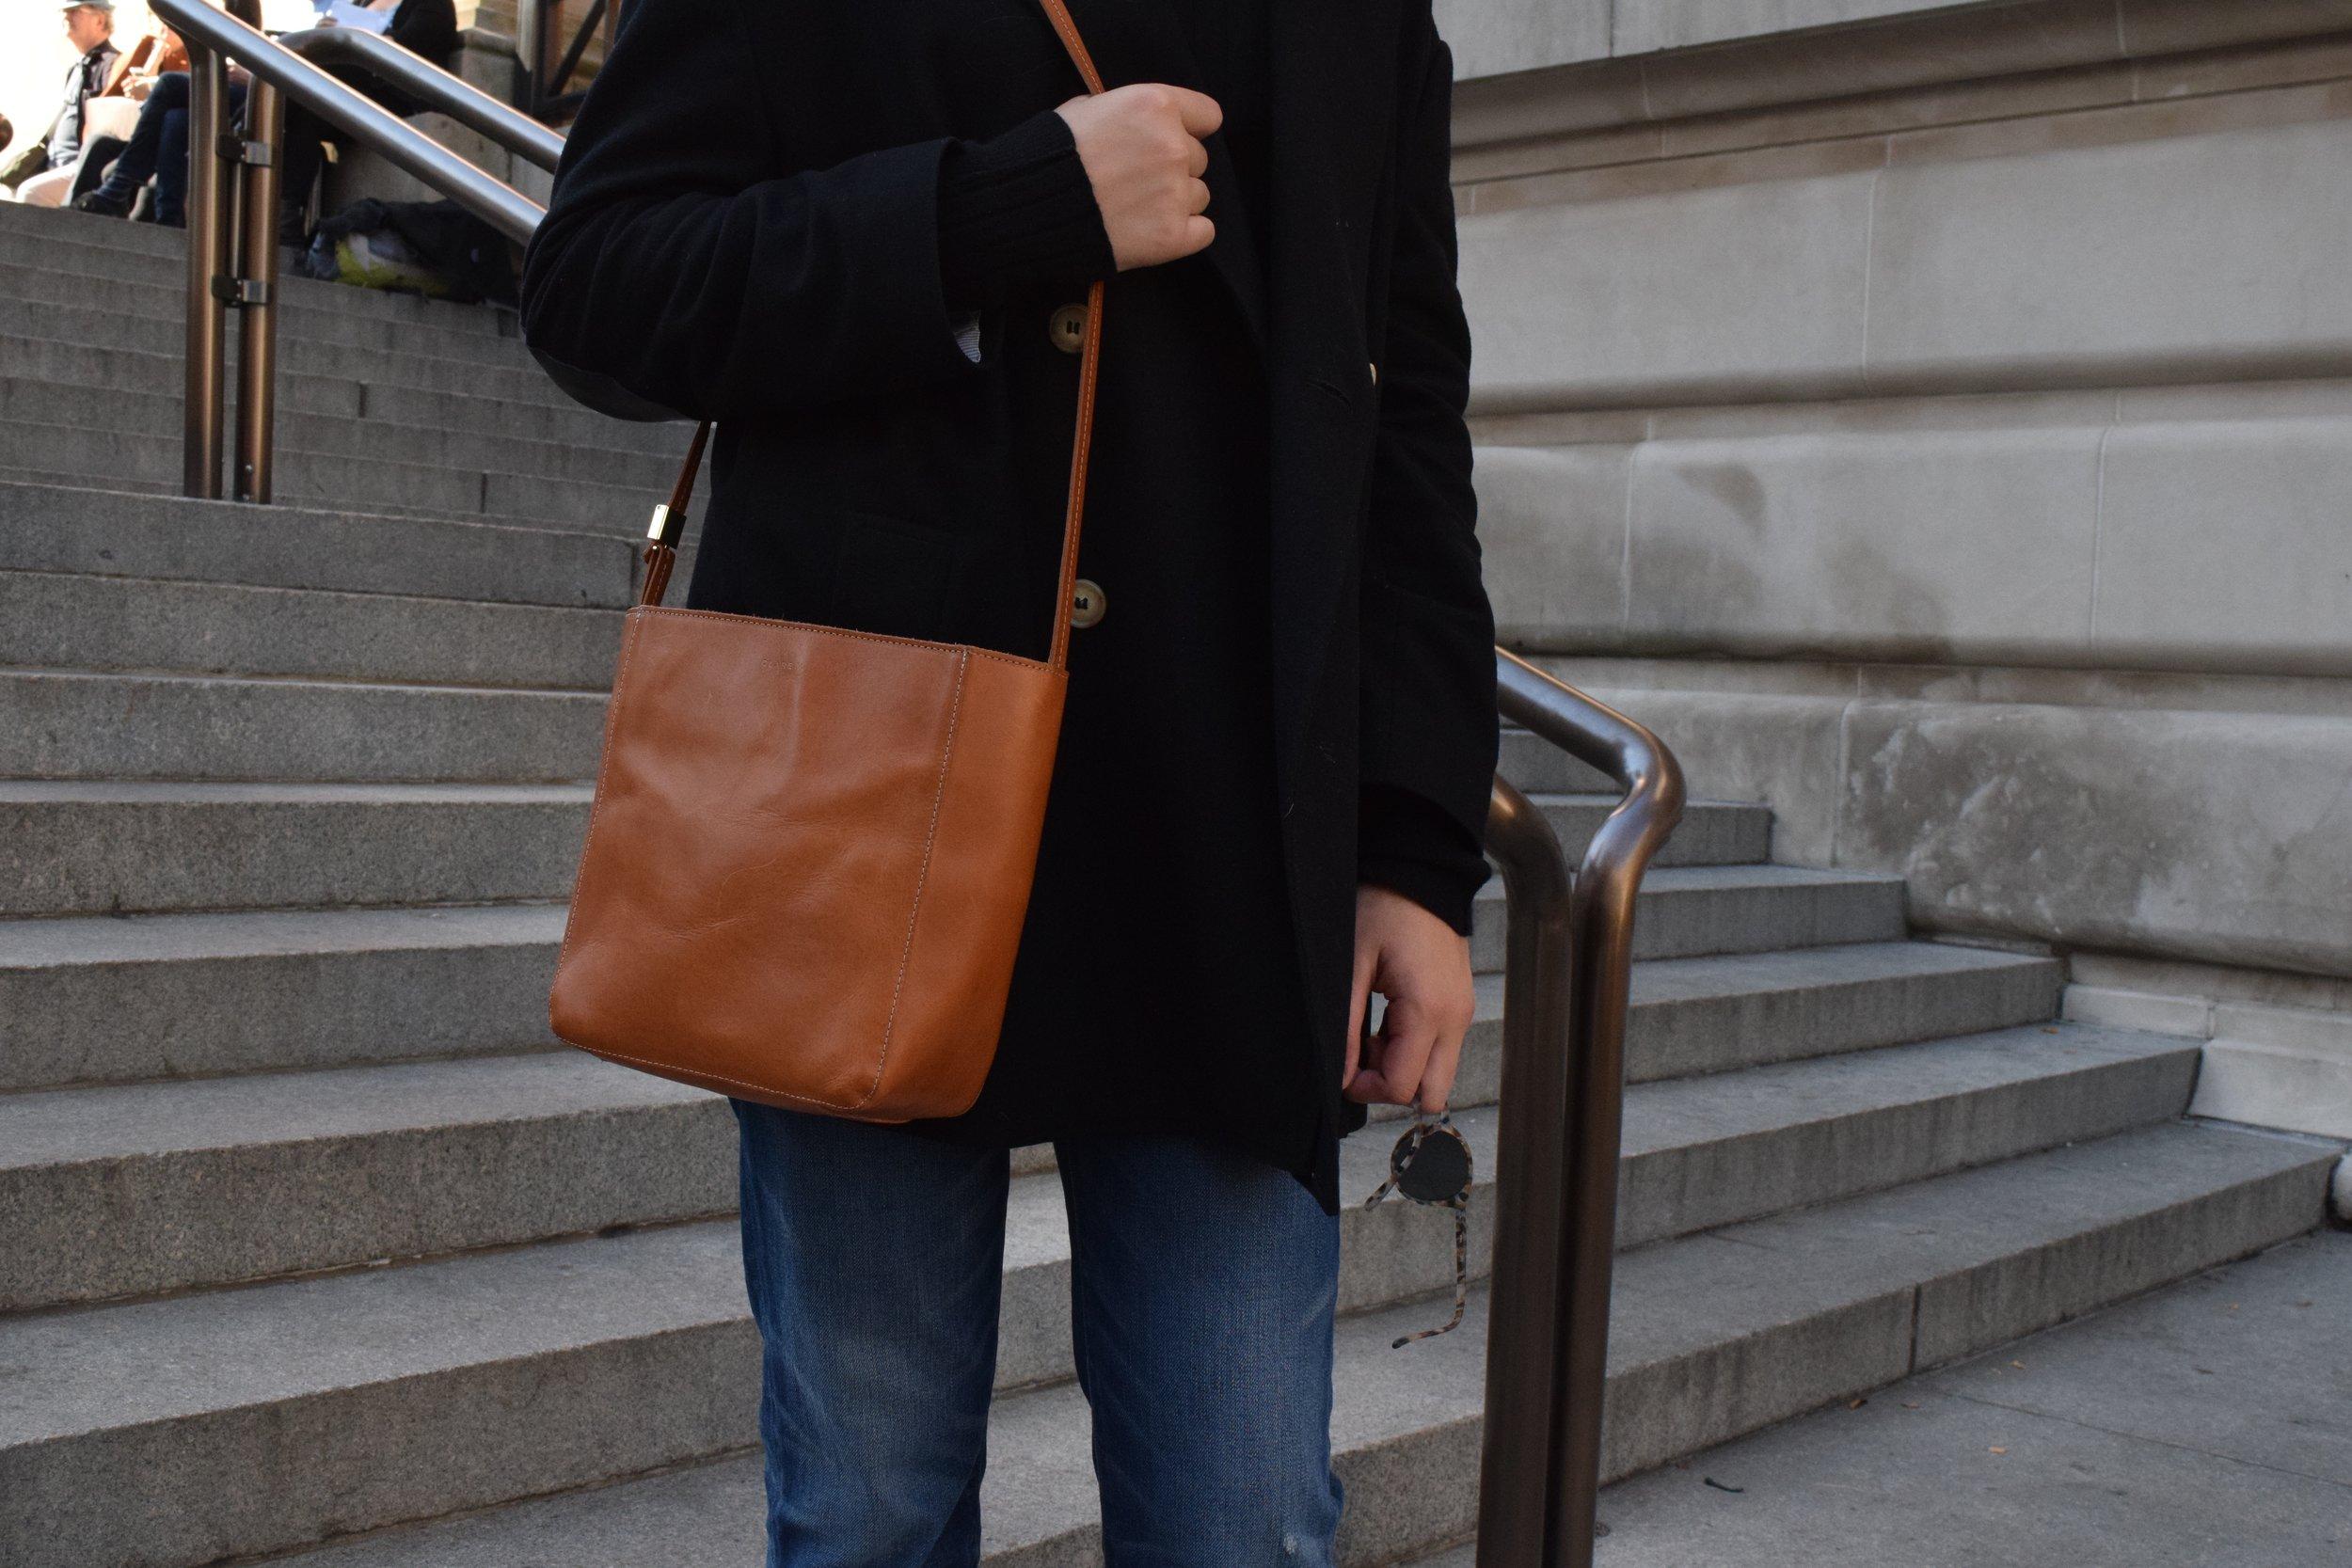 My Clare Vivier purse & my See sunglasses